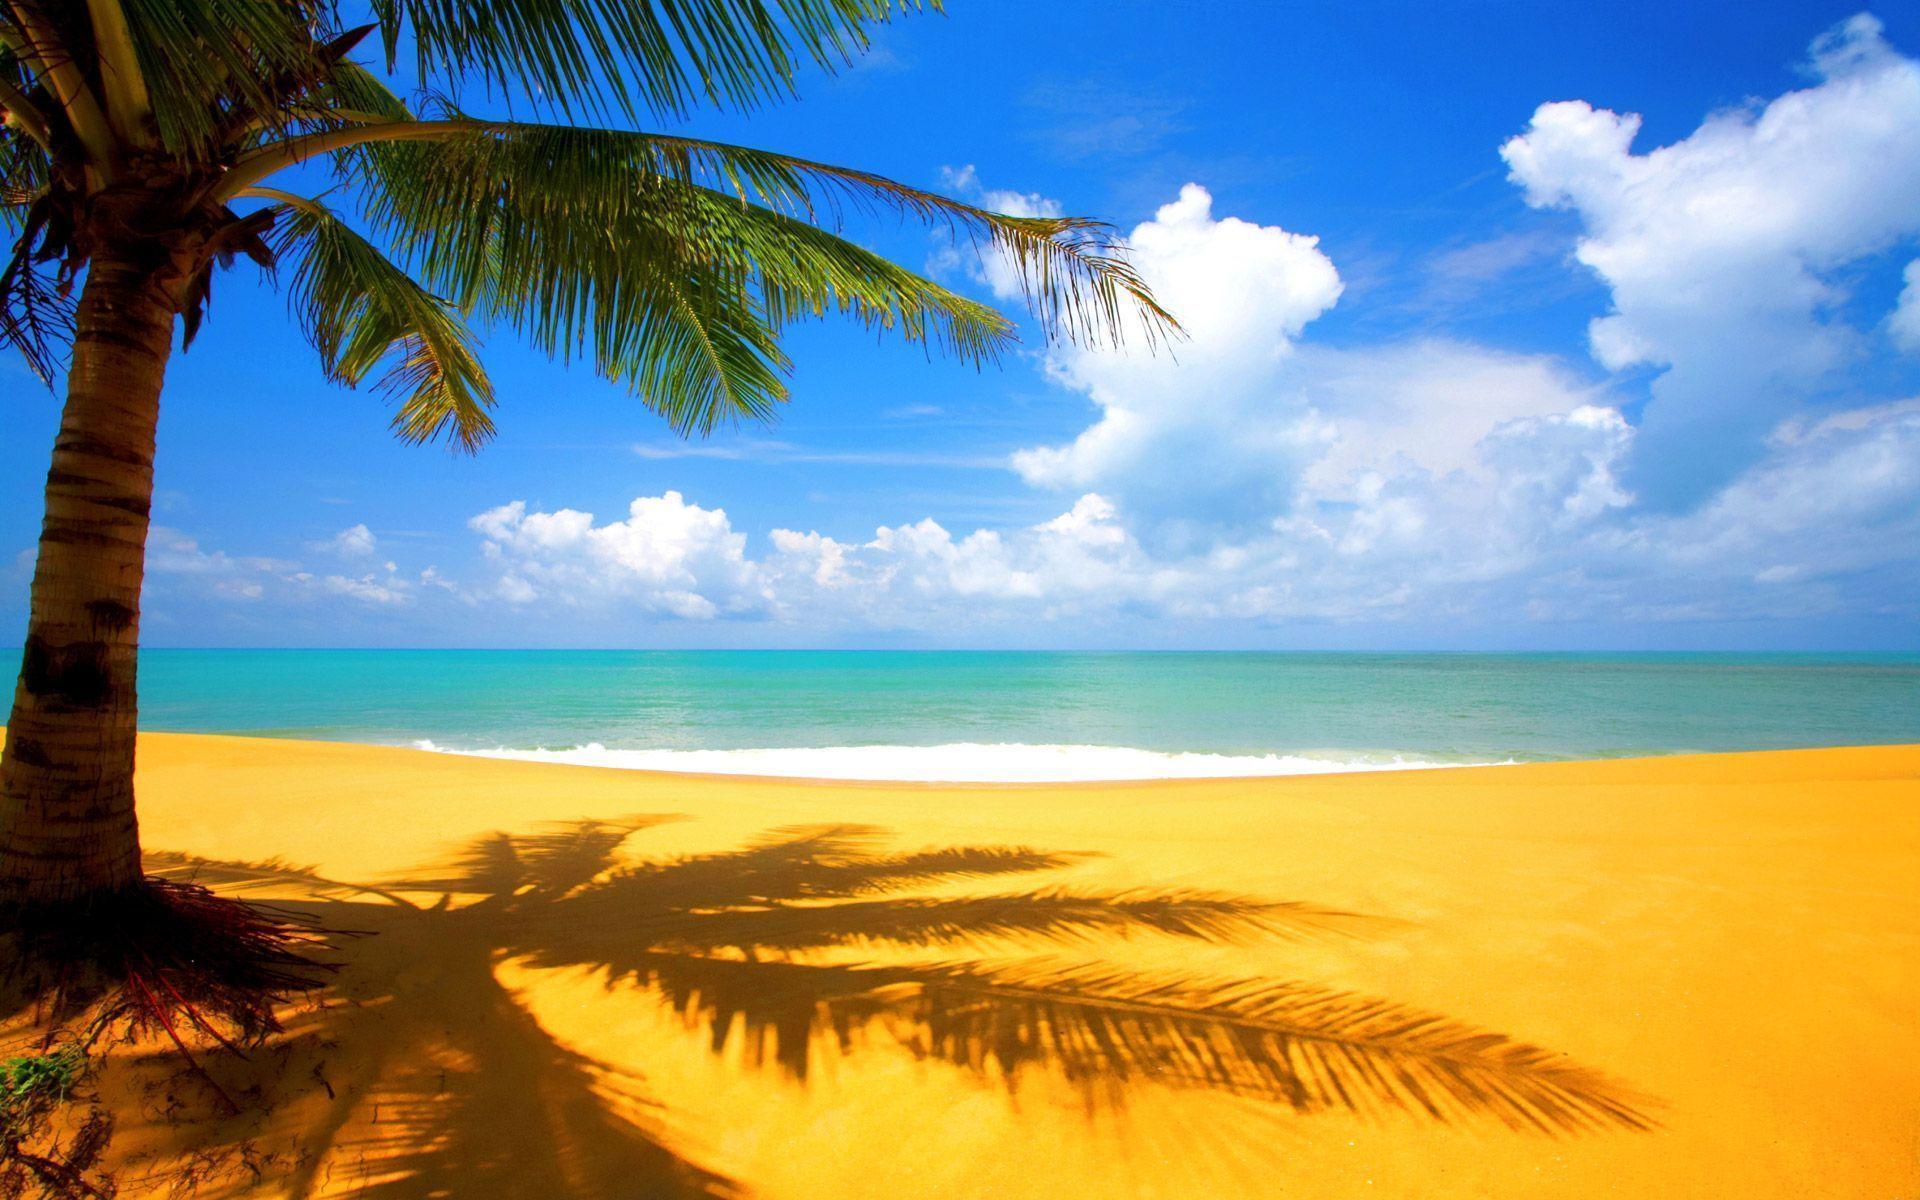 Beautiful Beach Scenery Wallpaper